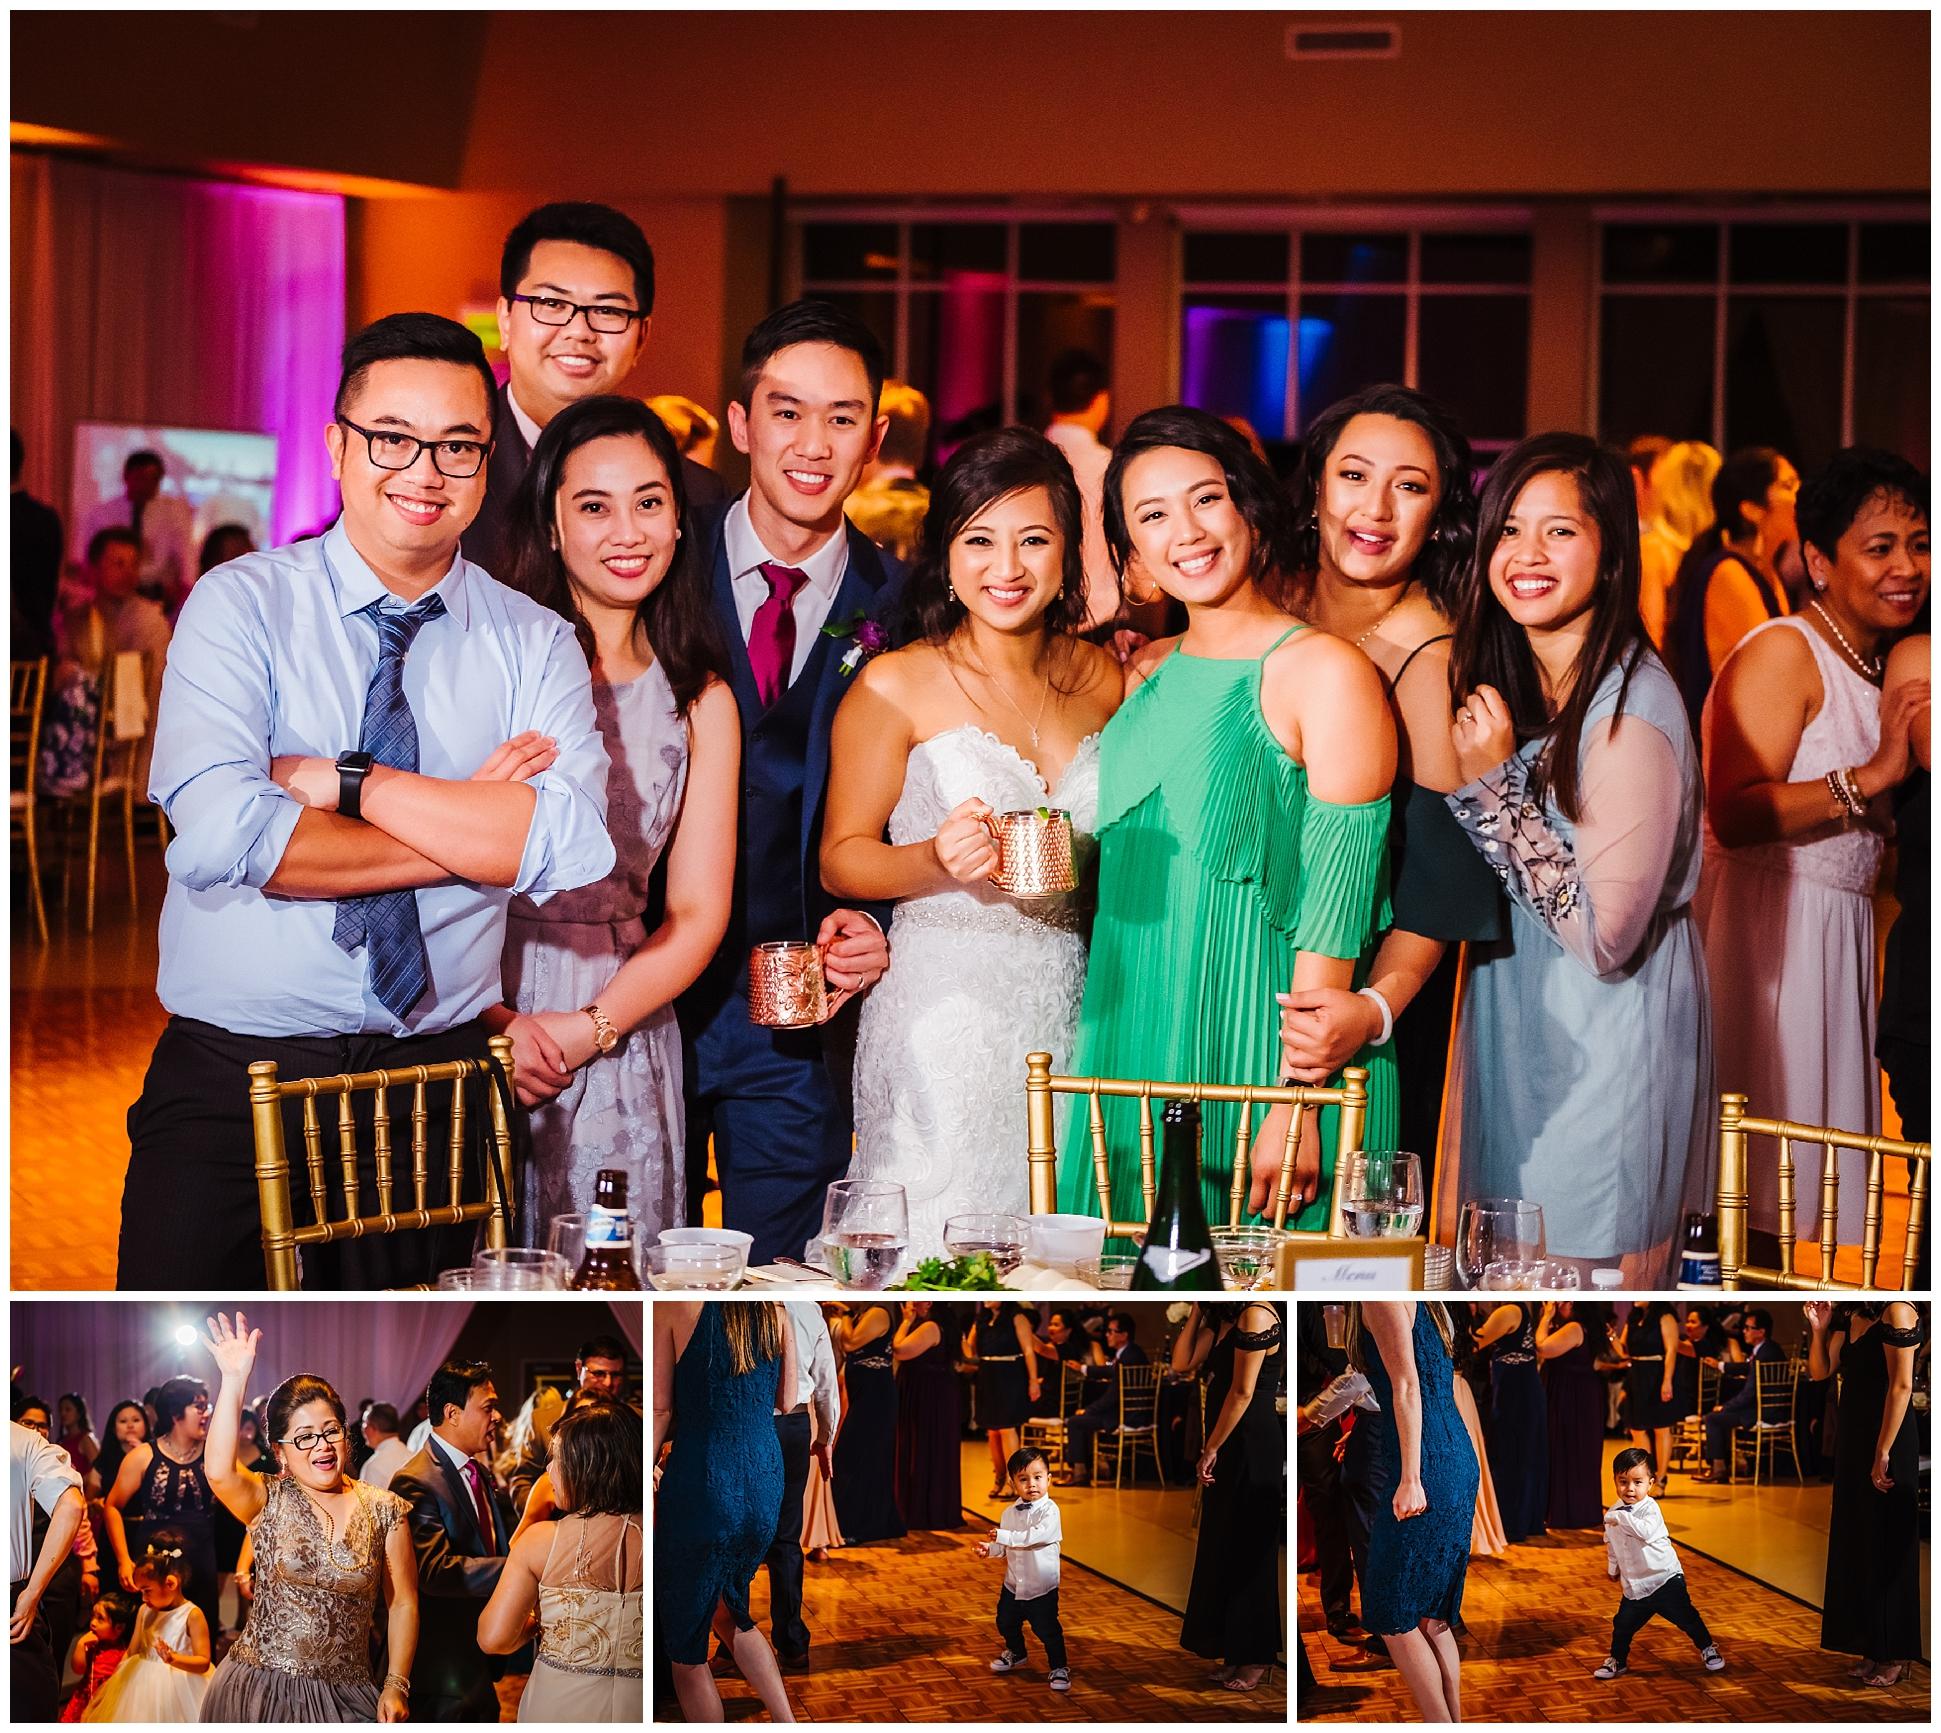 tampa-wedding-photographer-philipino-colorful-woods-ballroom-church-mass-confetti-fuscia_0072.jpg